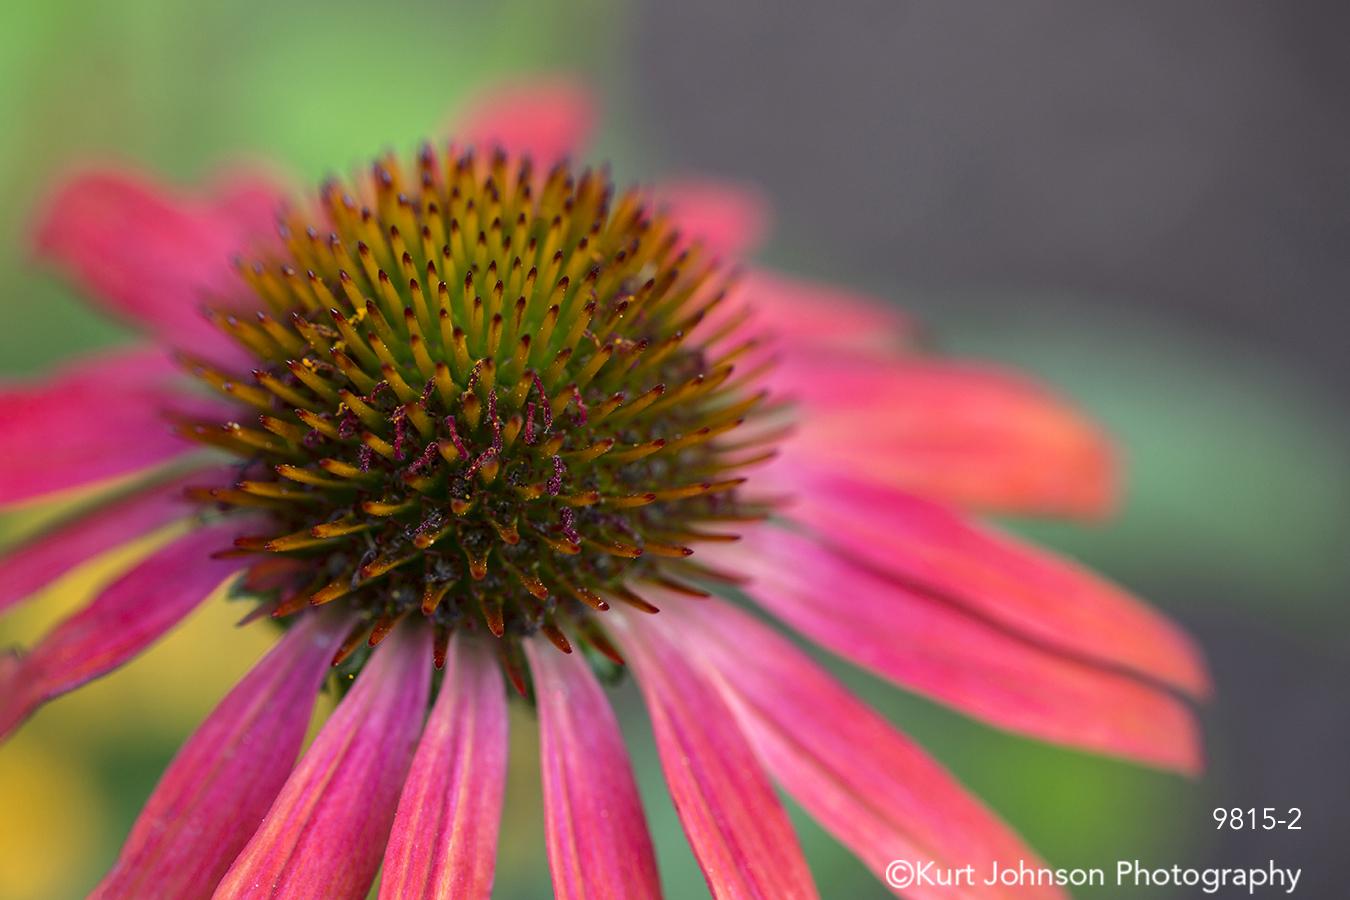 flower pink bloom petal petals bright coneflower magenta detail closeup